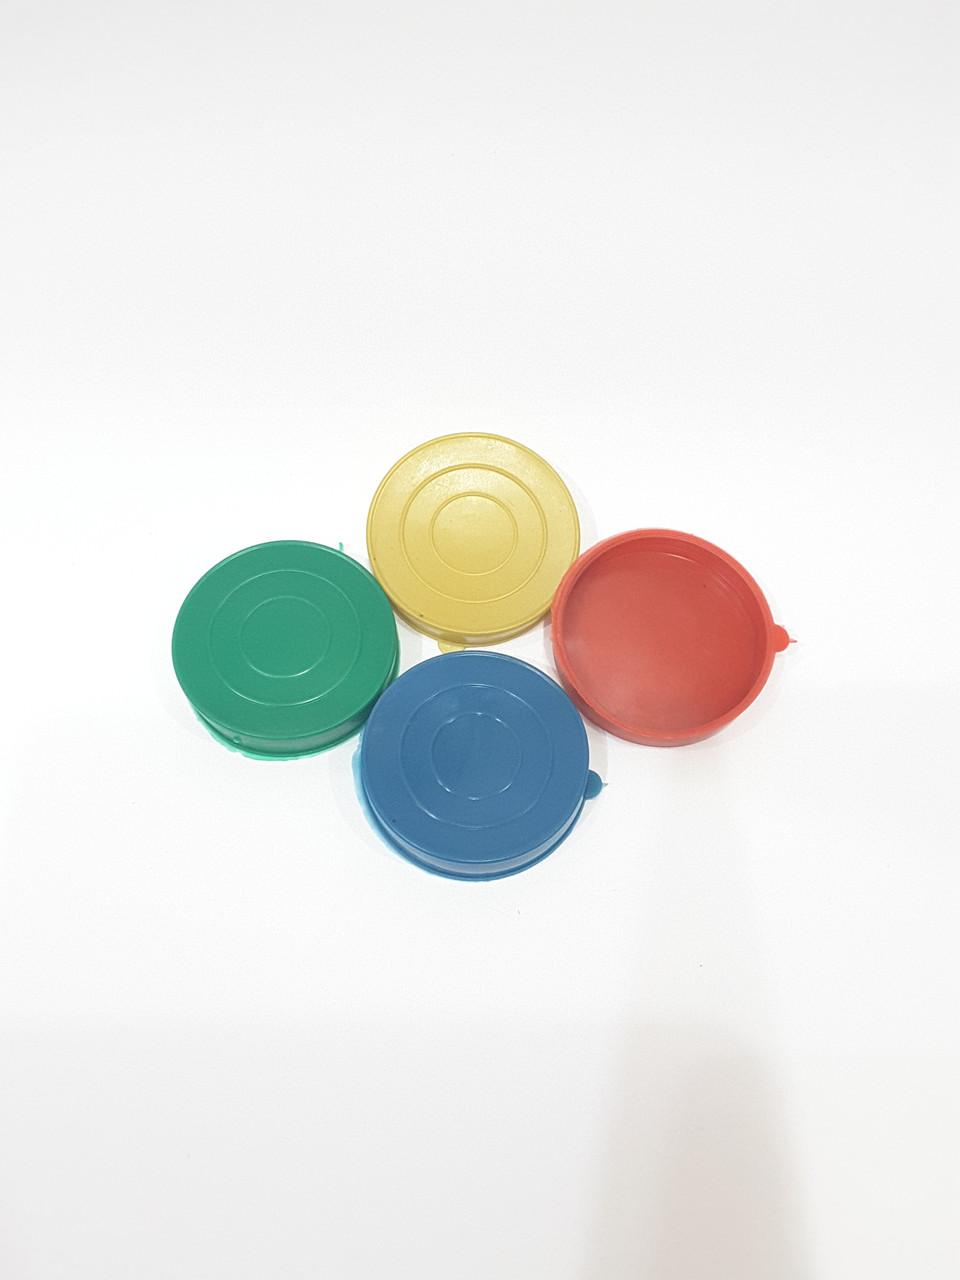 Крышка пластмассовая для майонезных банок